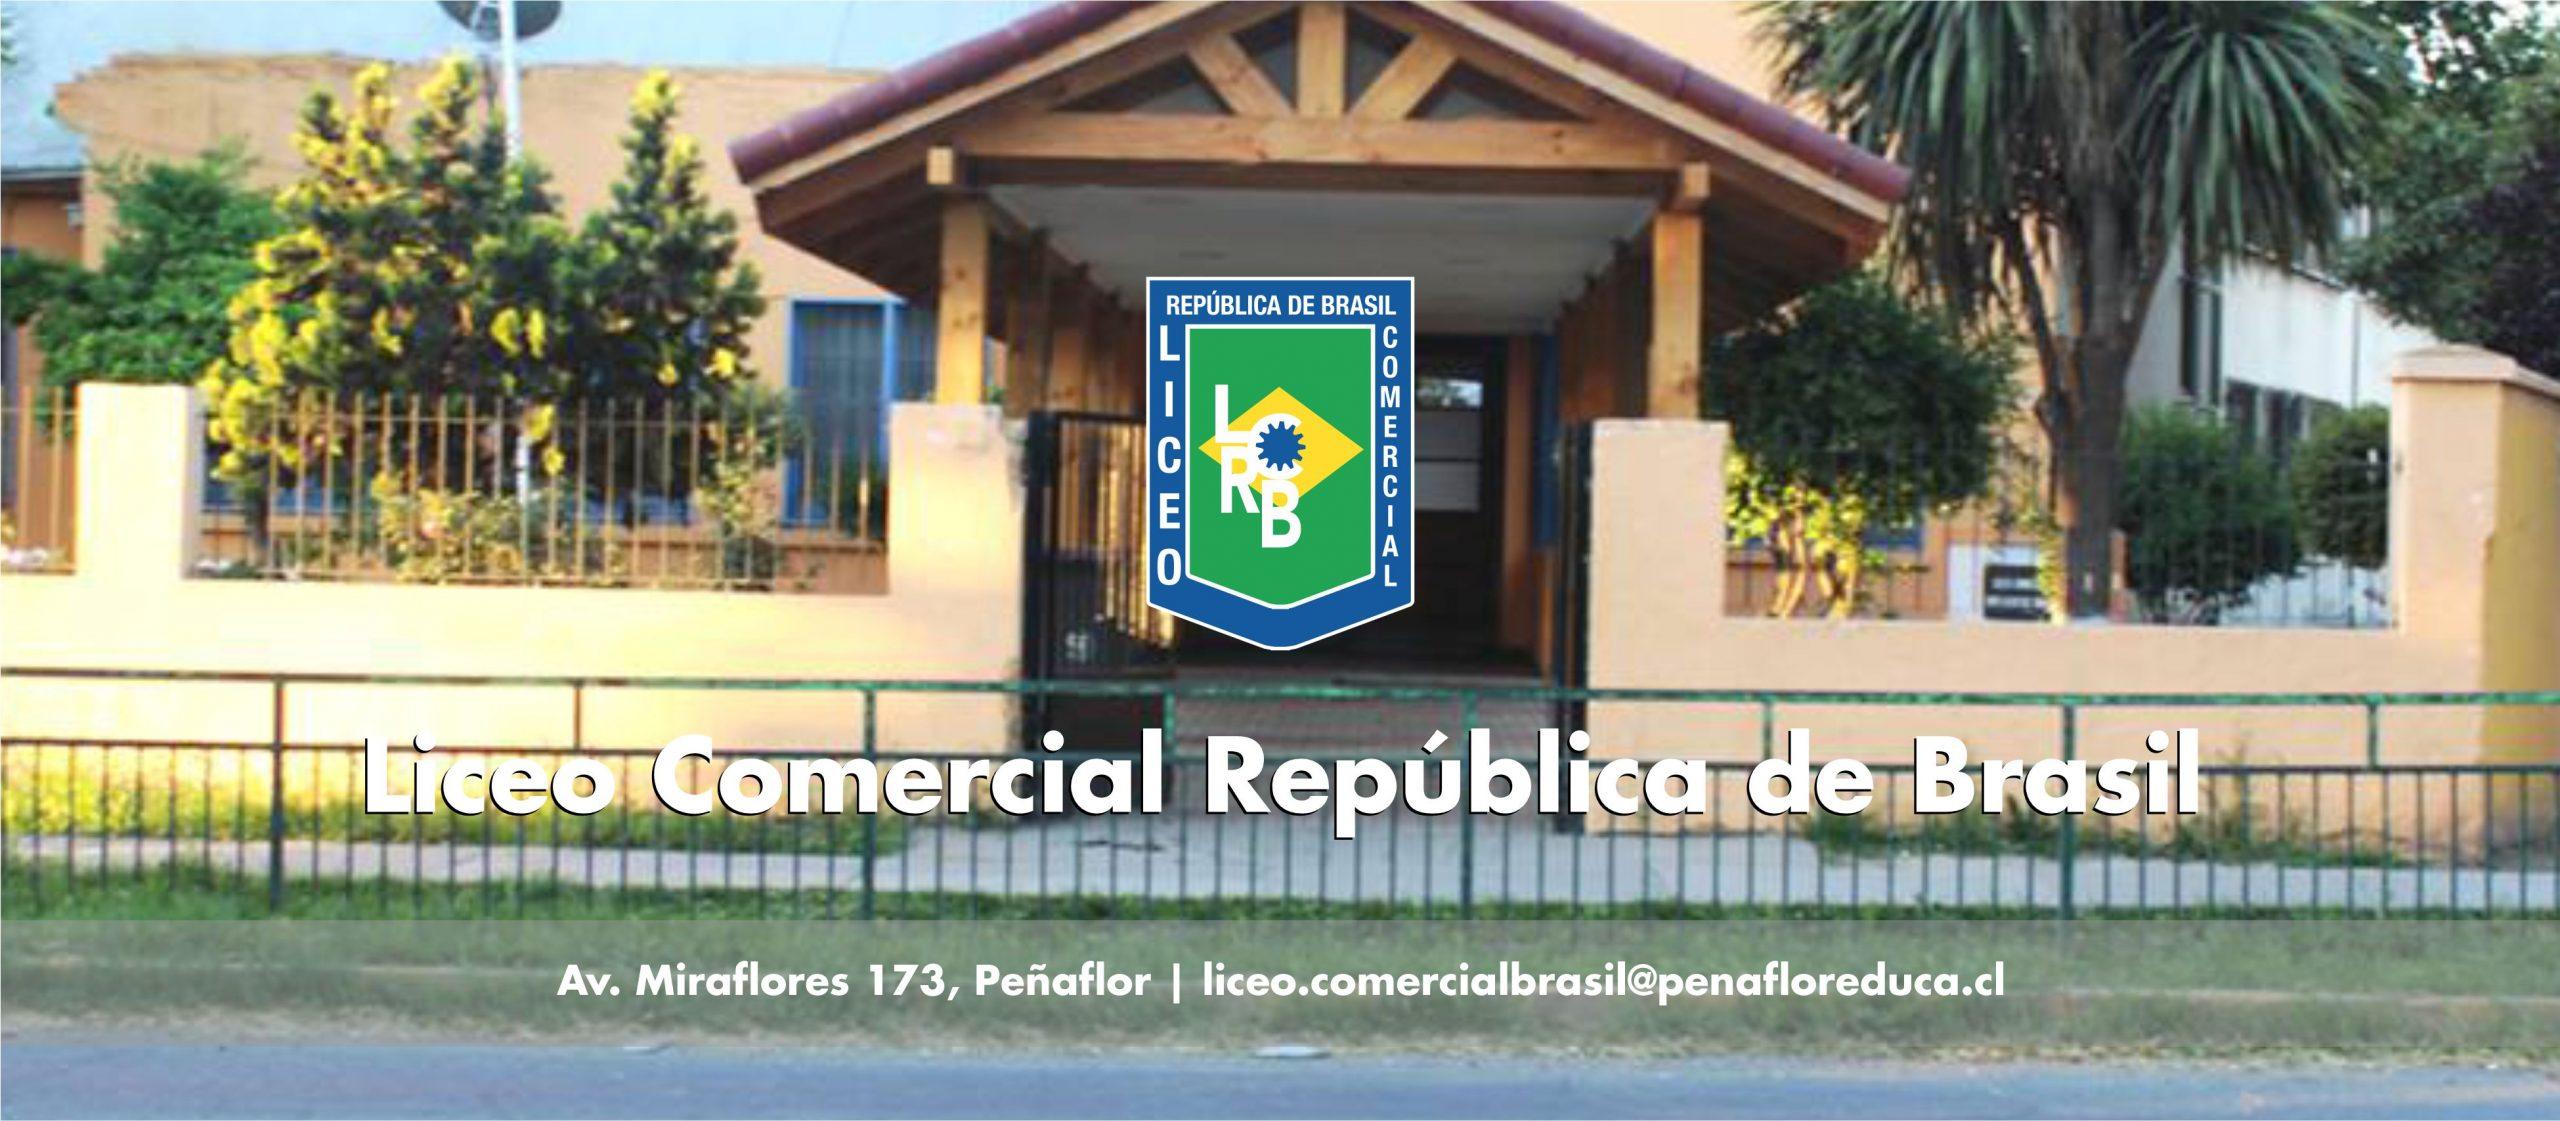 Liceo Comercial República de Brasil